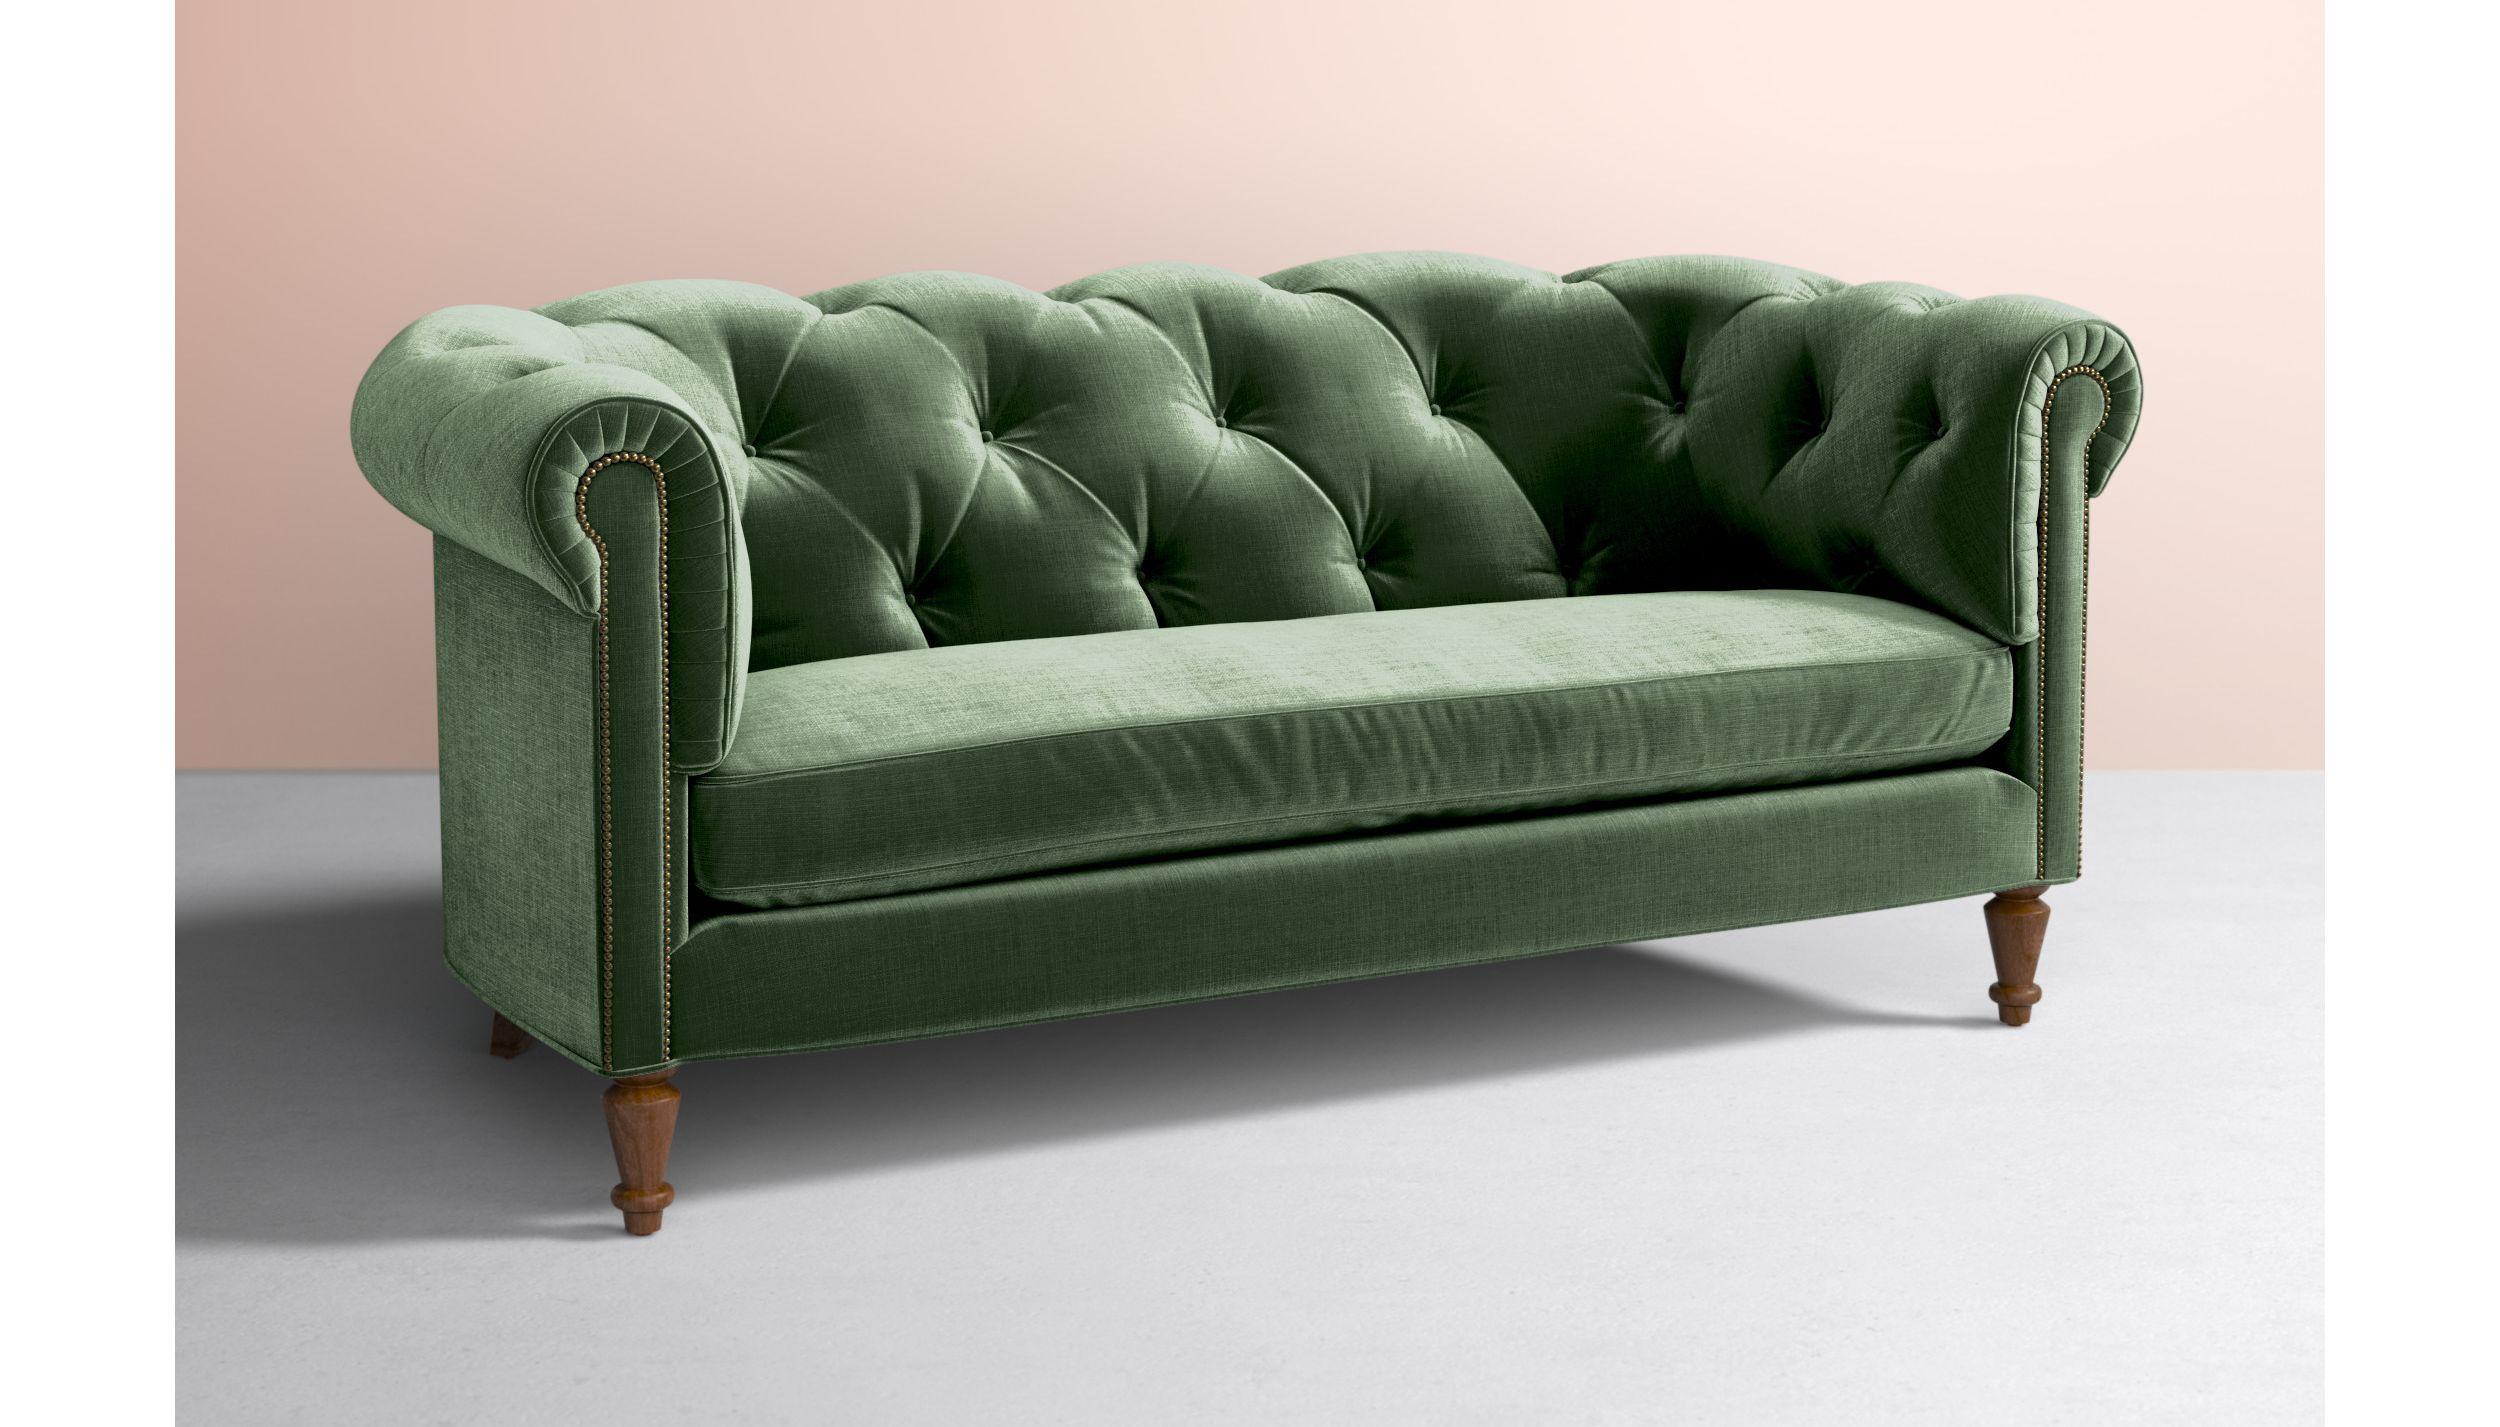 Atelier Sofa Sofas For Small Spaces Sofa Best Sofa